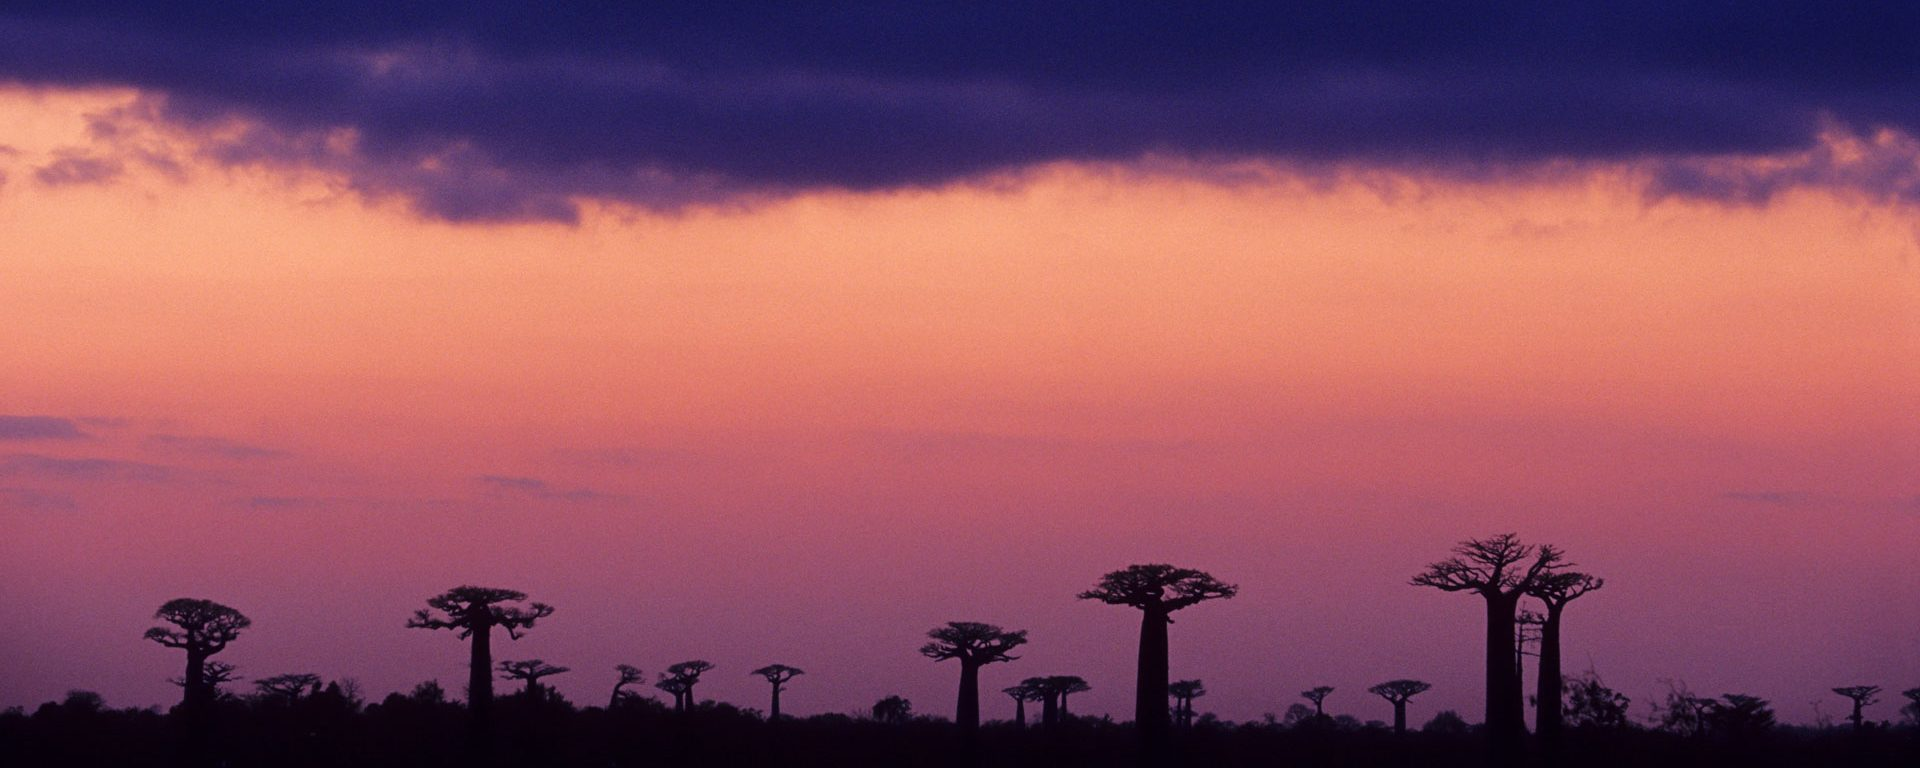 Baobab Avenue at sunset in Morondava, Madagascar, Africa